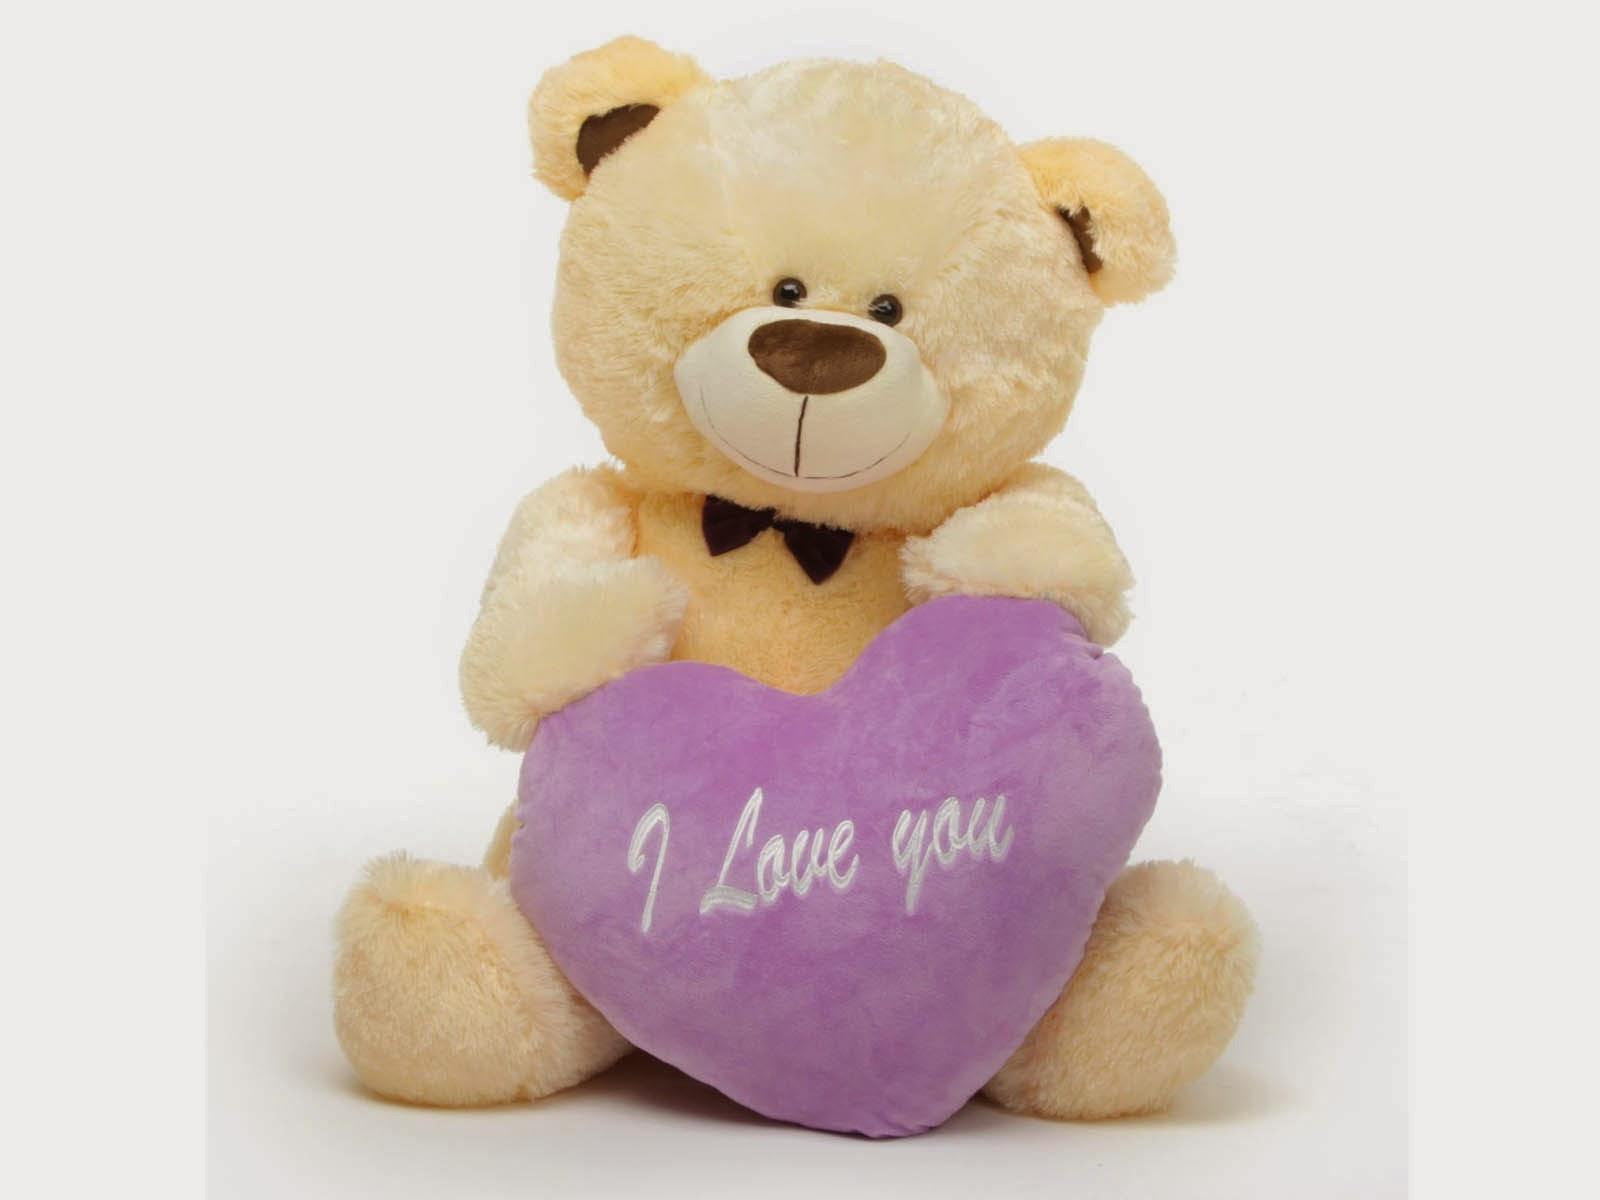 teddy bear hd wallpapers - wallpapers